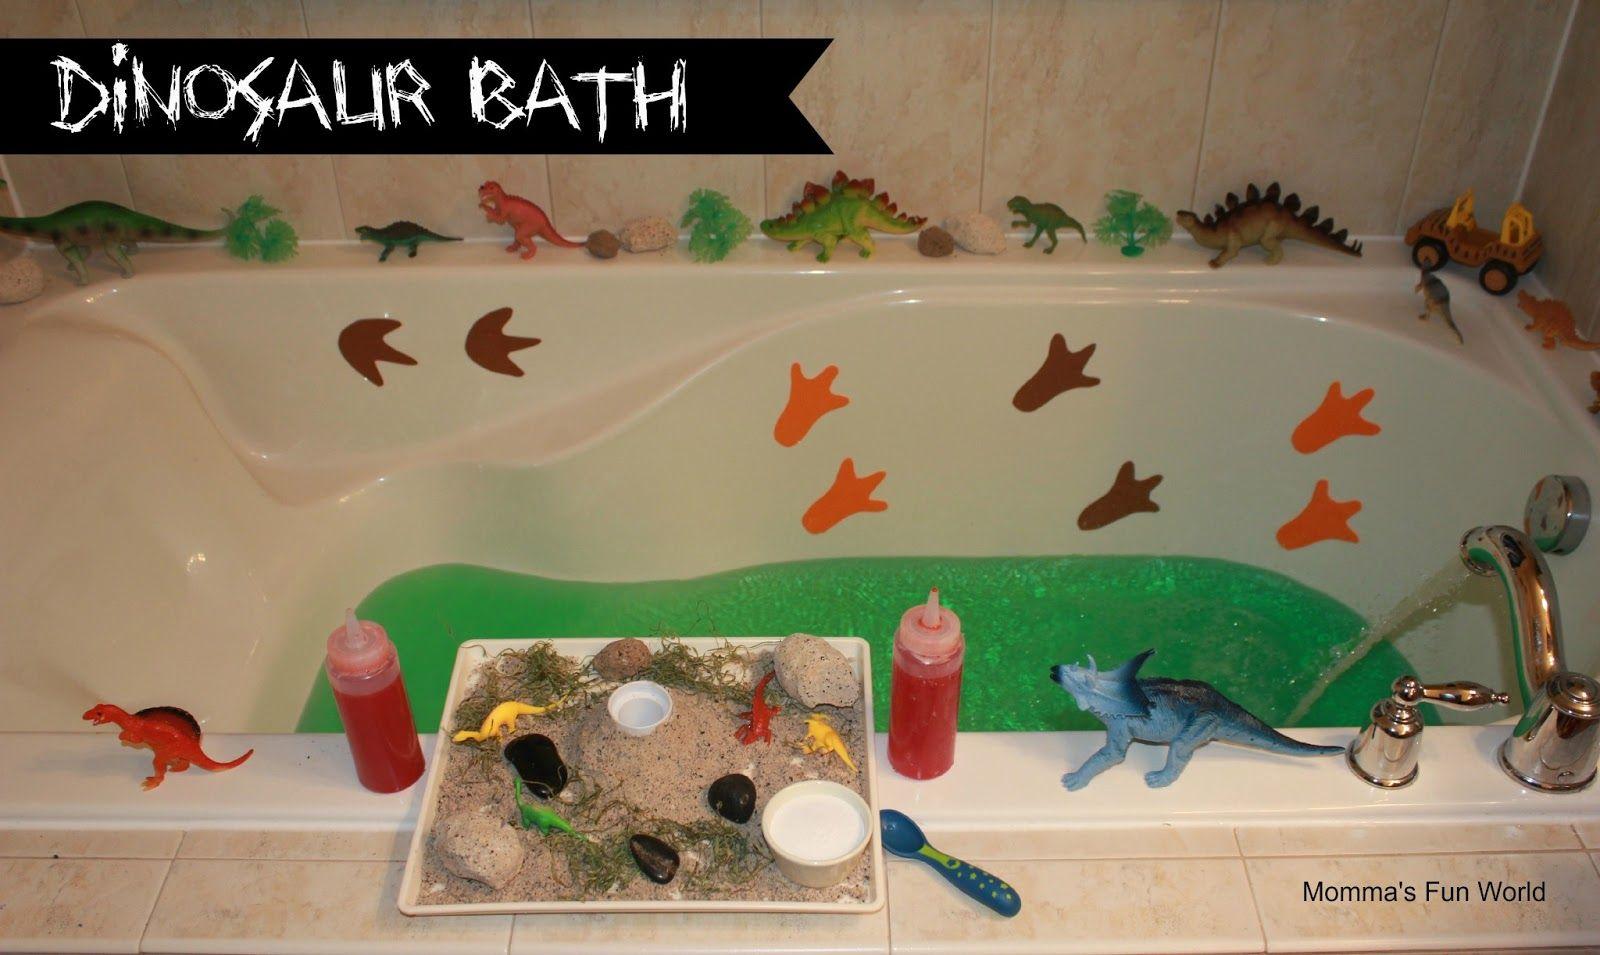 Dinosaur eggs erupting bath fun fun for all ages - easy to make eva ...